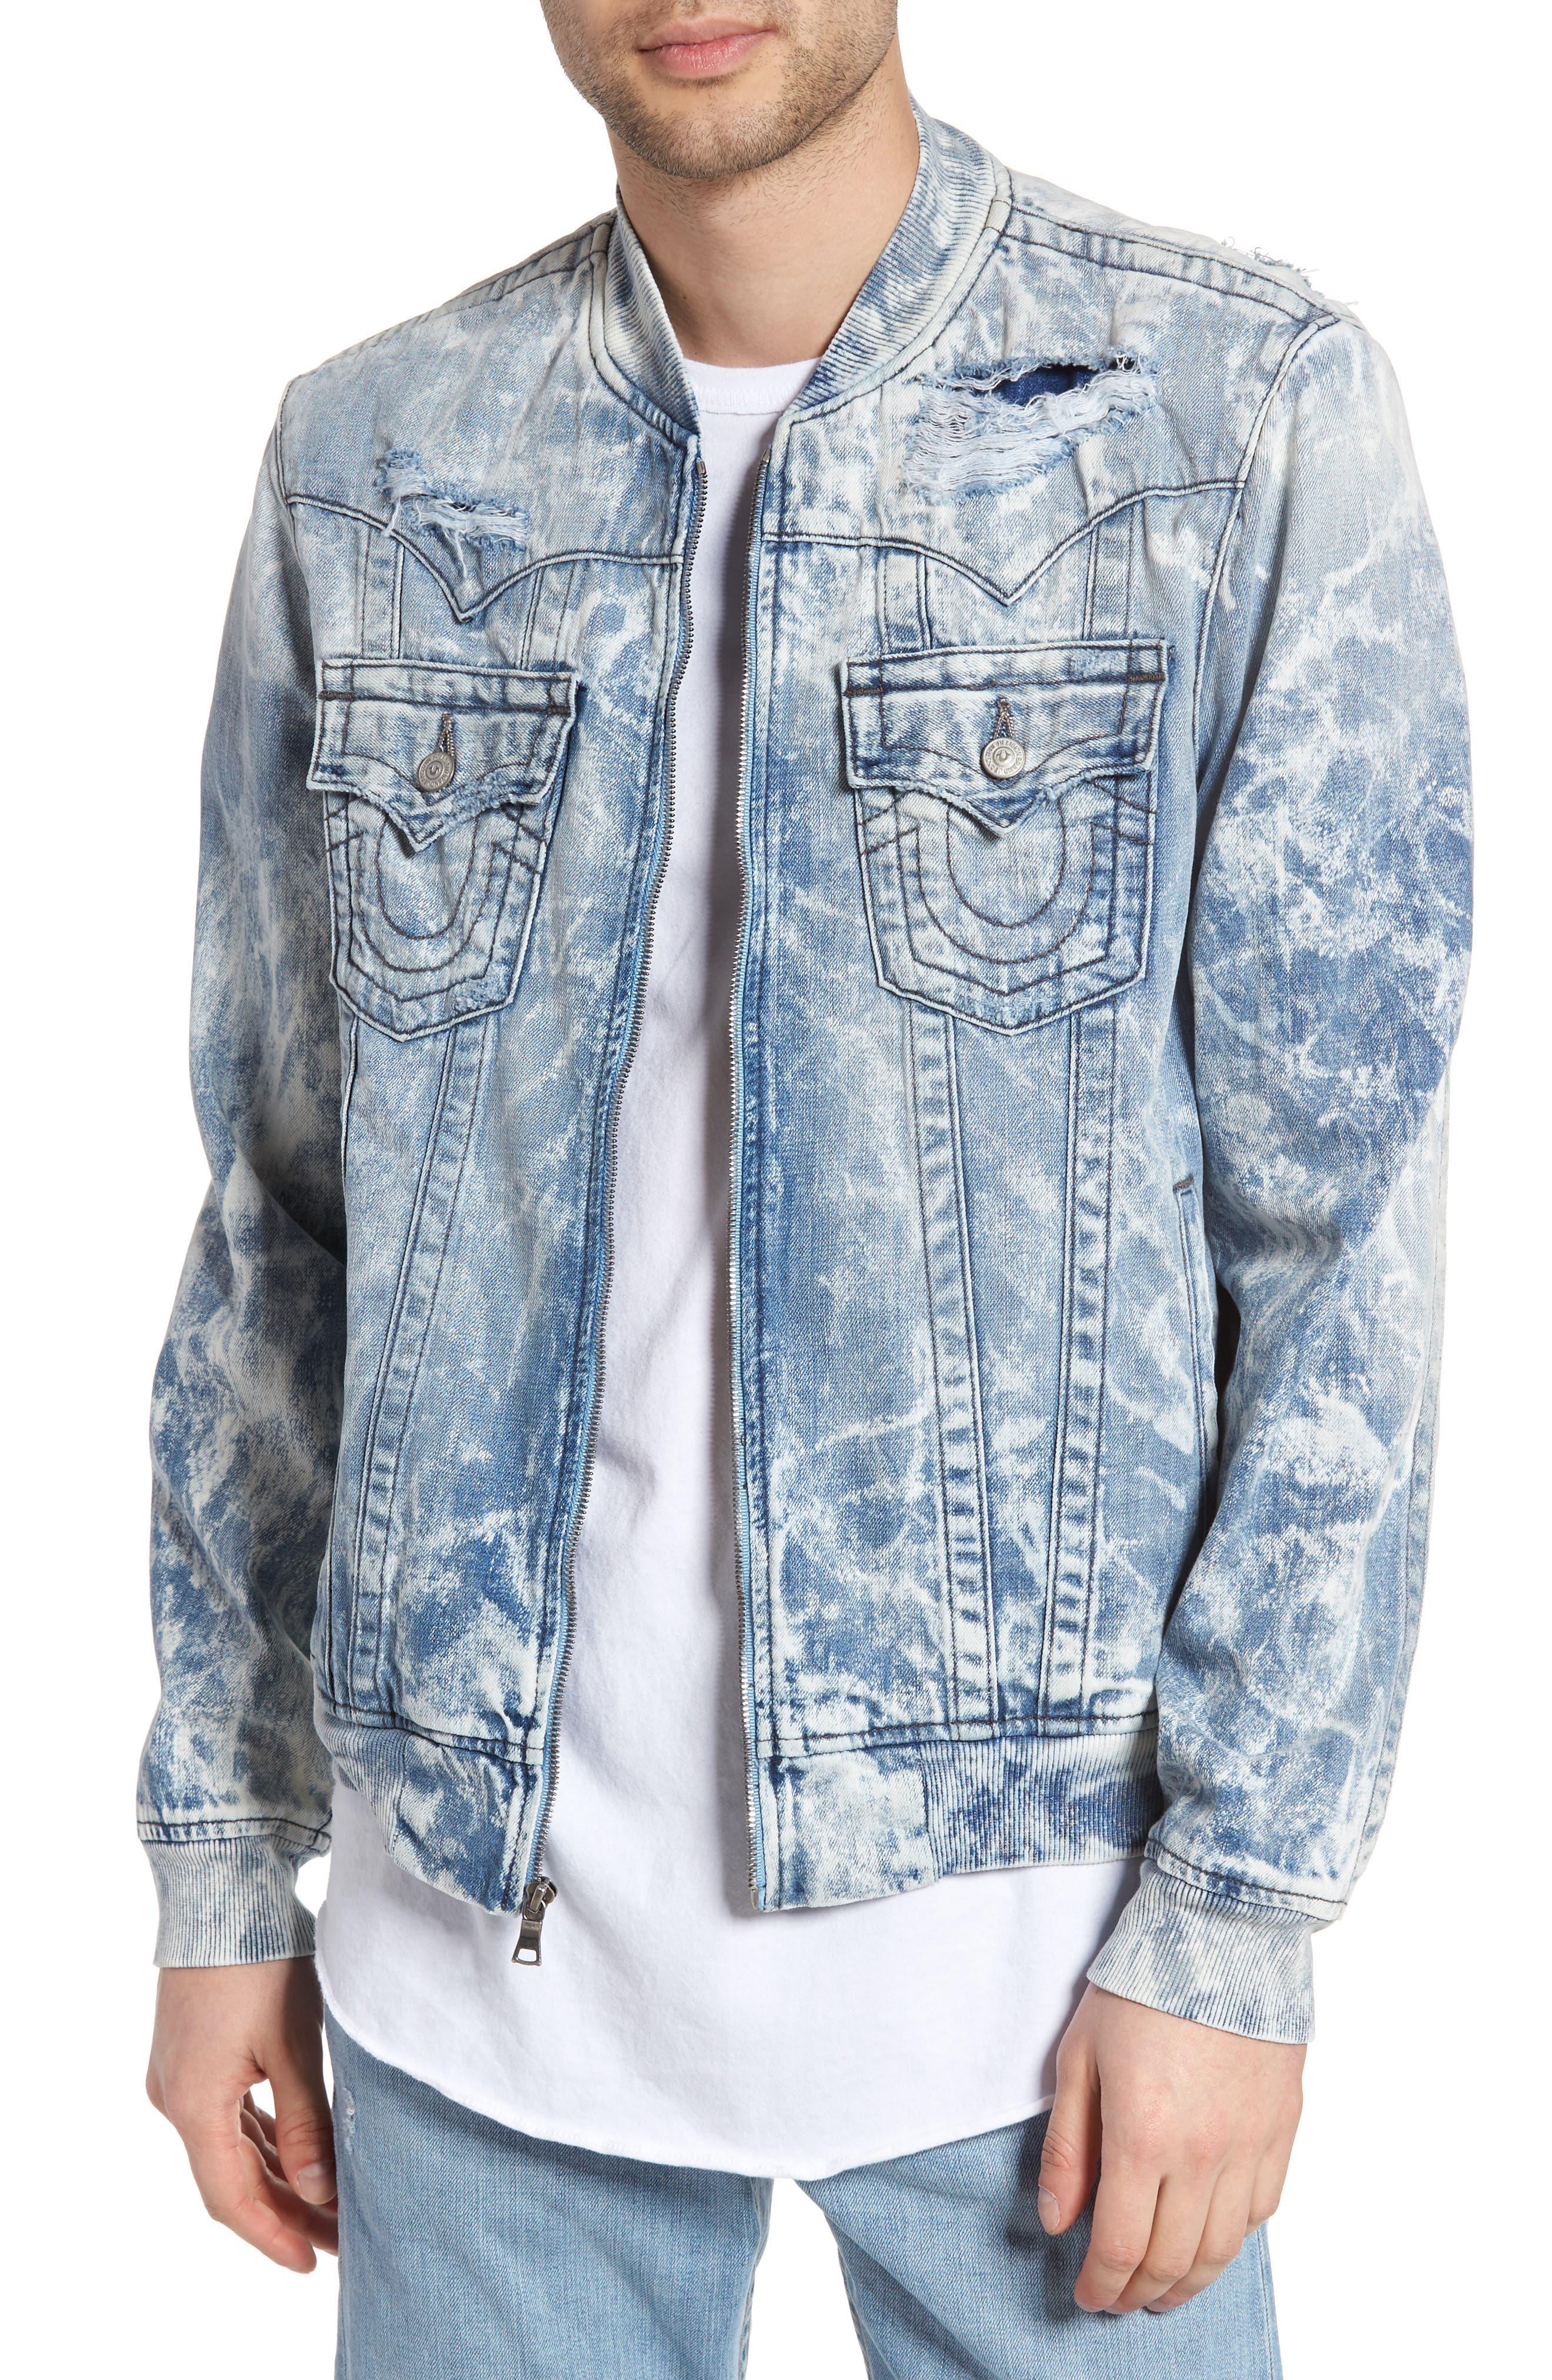 Alternate Image 1 Selected - True Religion Brand Jeans Jimmy Bleached Denim Bomber Jacket